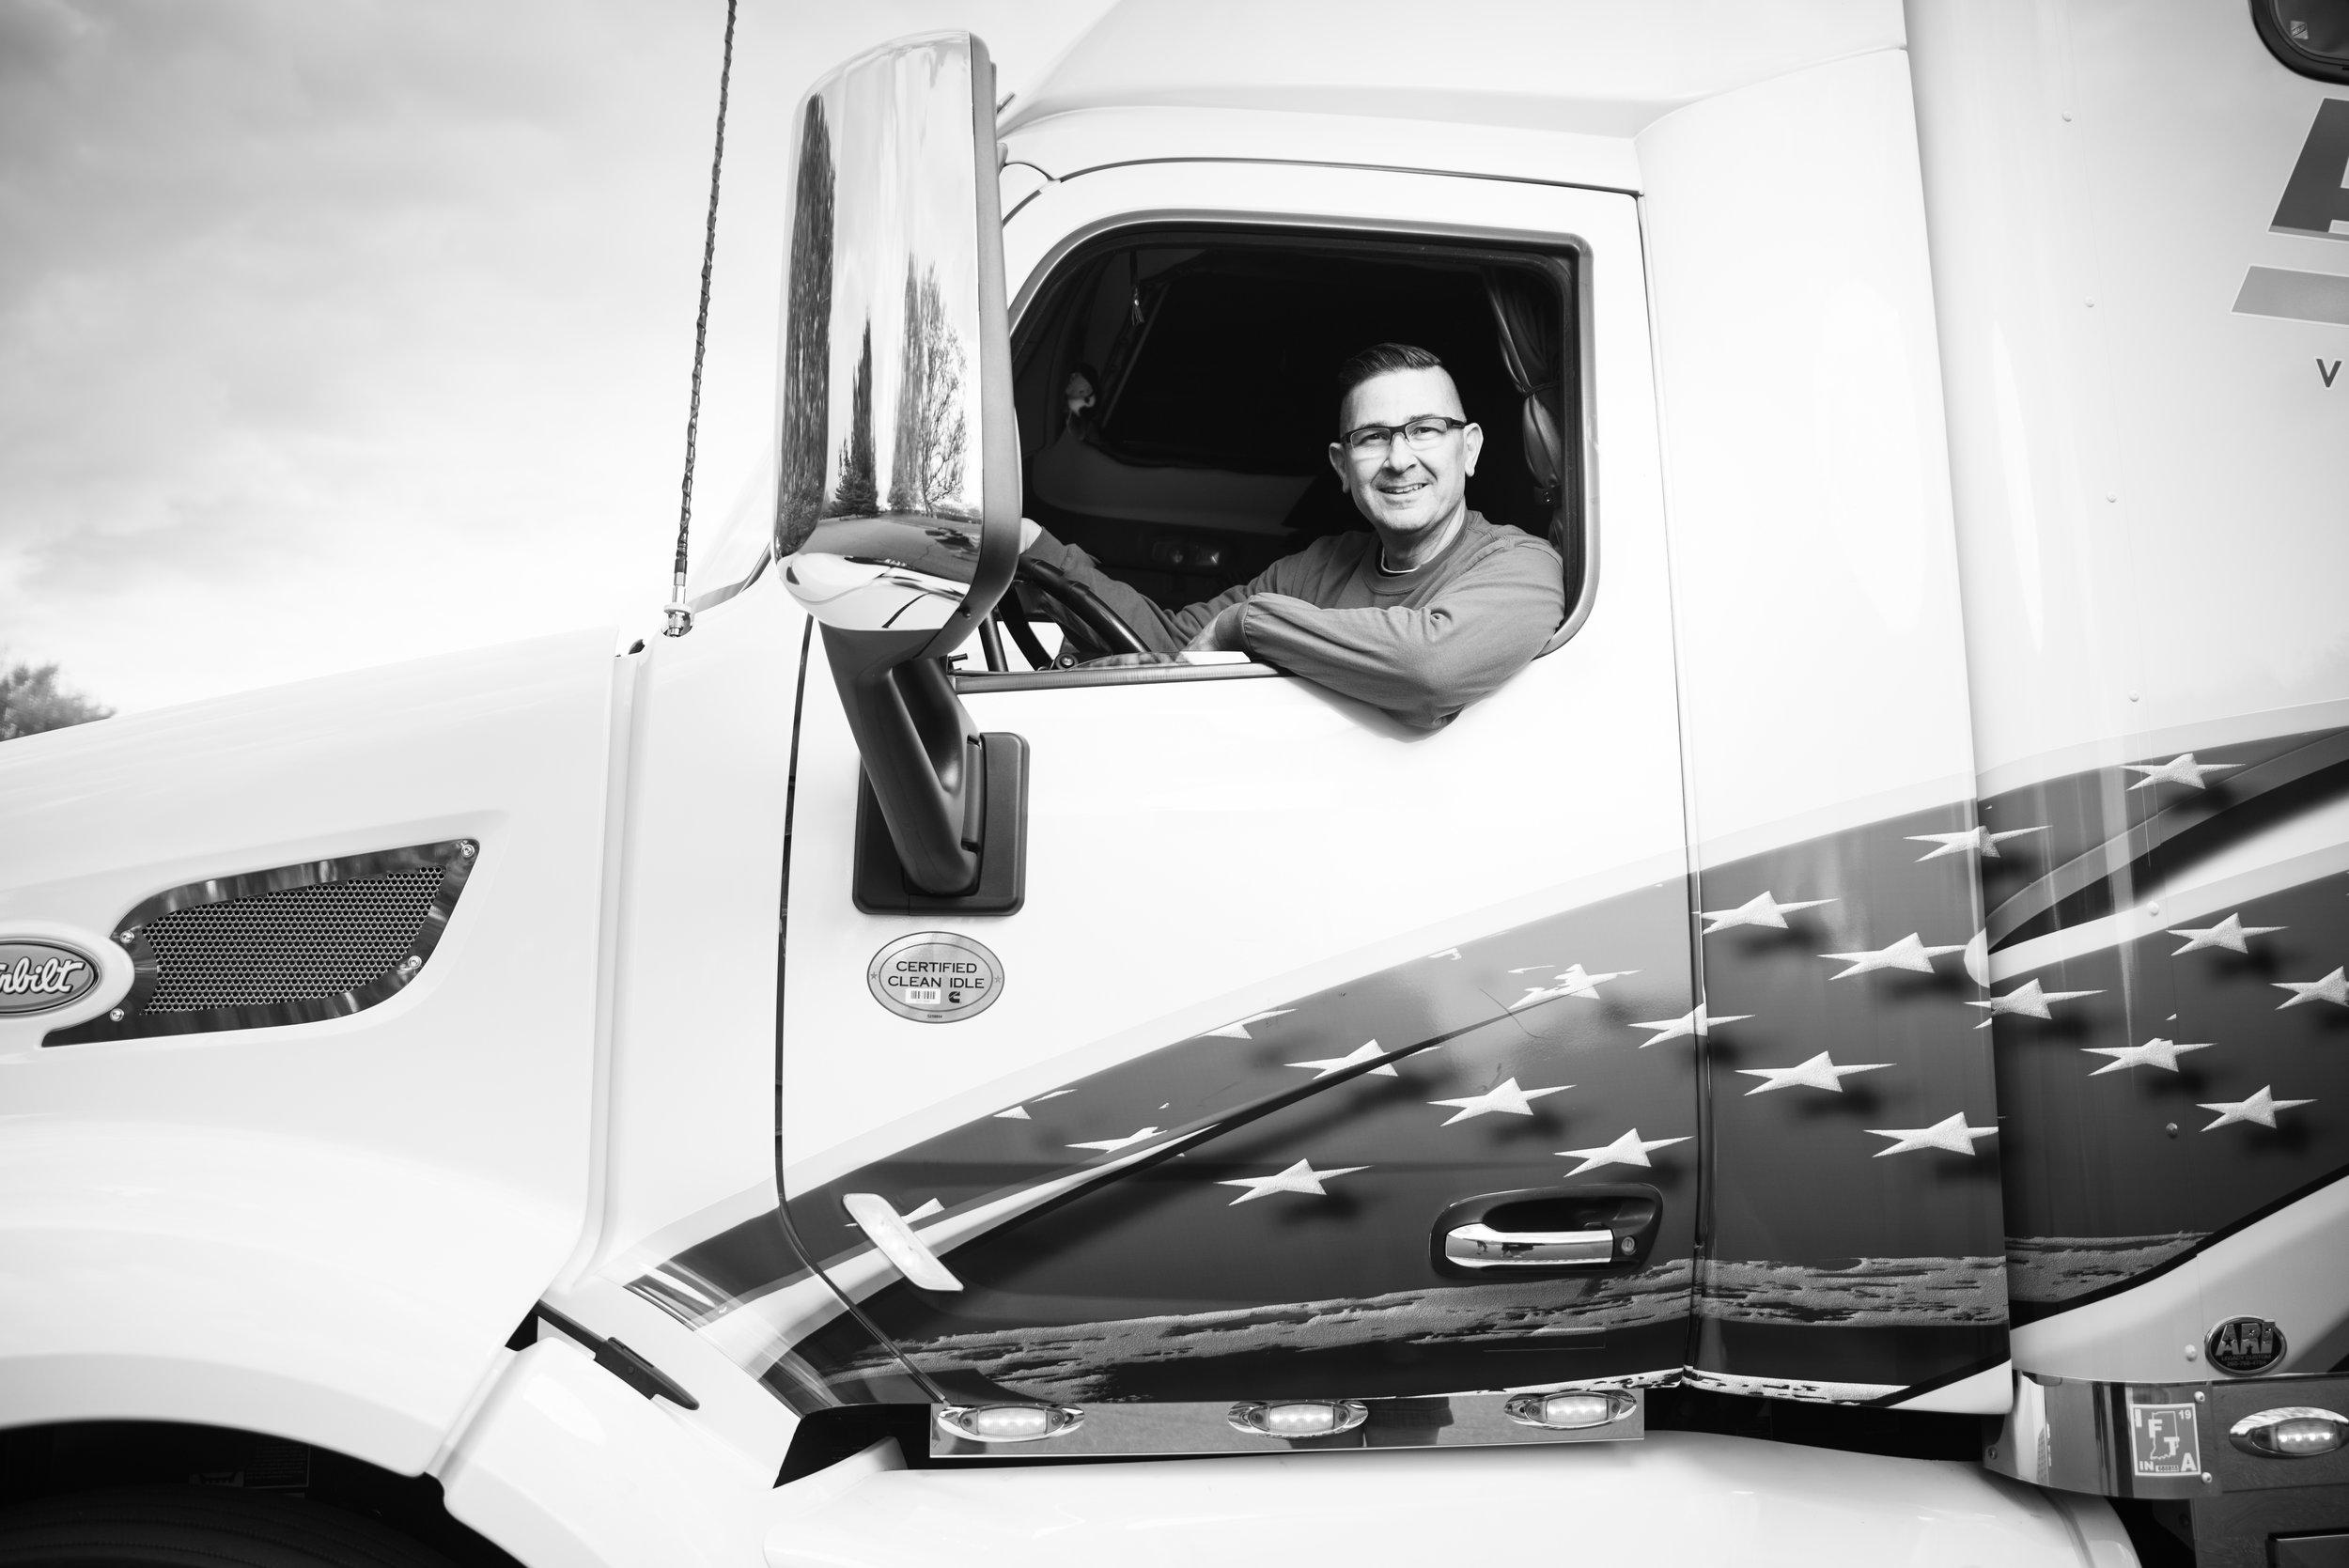 2019_April_20-Paul_Chavez_Truck_Shoot-54954.jpg